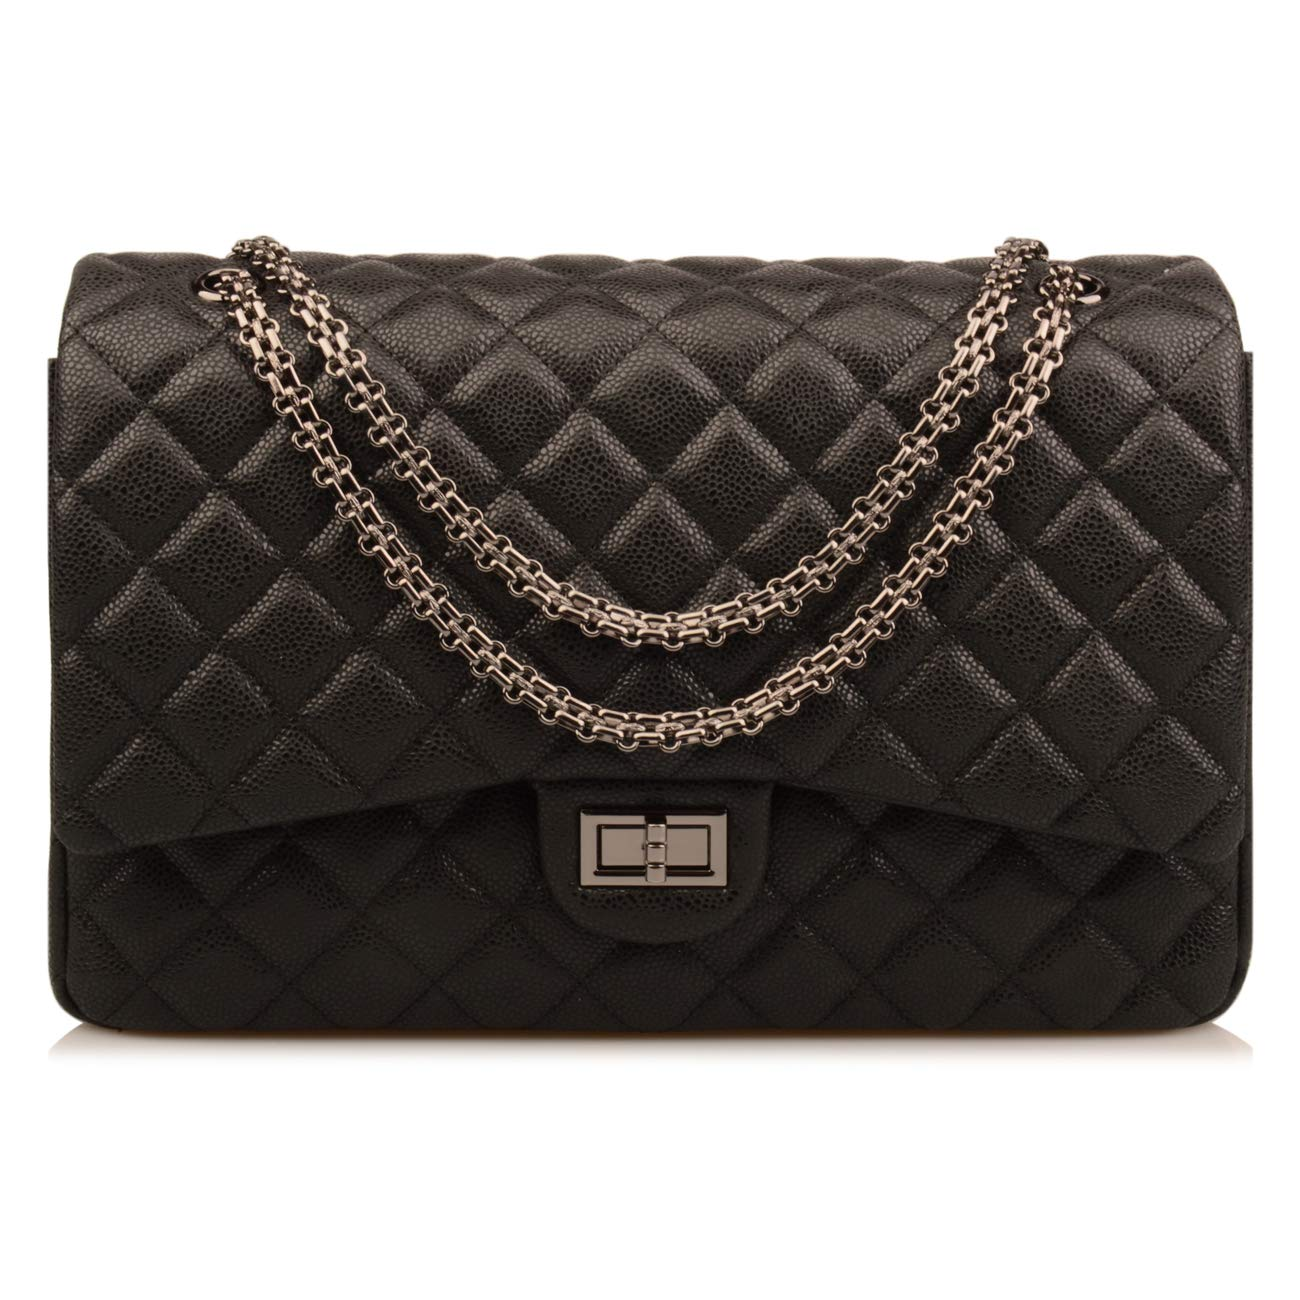 ba0683315778 Amazon.com: Ainifeel Women's Quilted Oversize Genuine Leather Shoulder  Handbag Hobo Bag Purse (X-Large, Black (stiff cow leather gunmetal  hardware)): Shoes